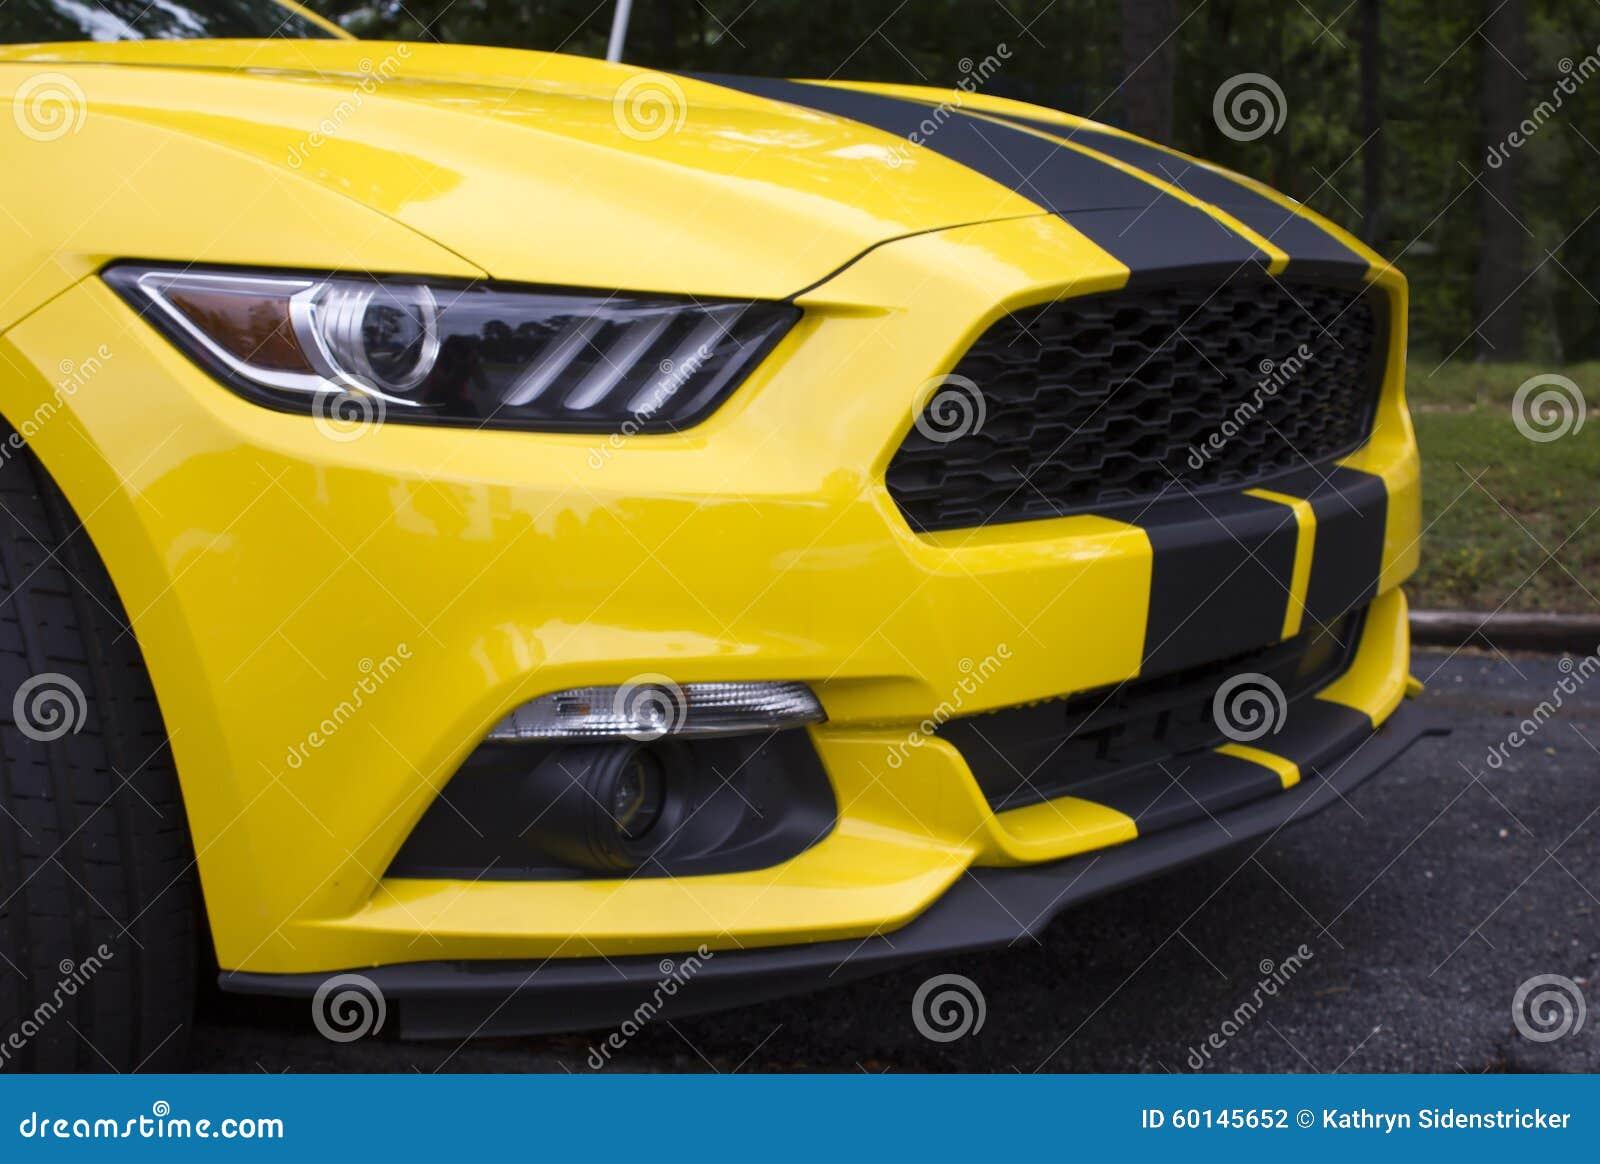 yellow car 2015 09 - photo #39